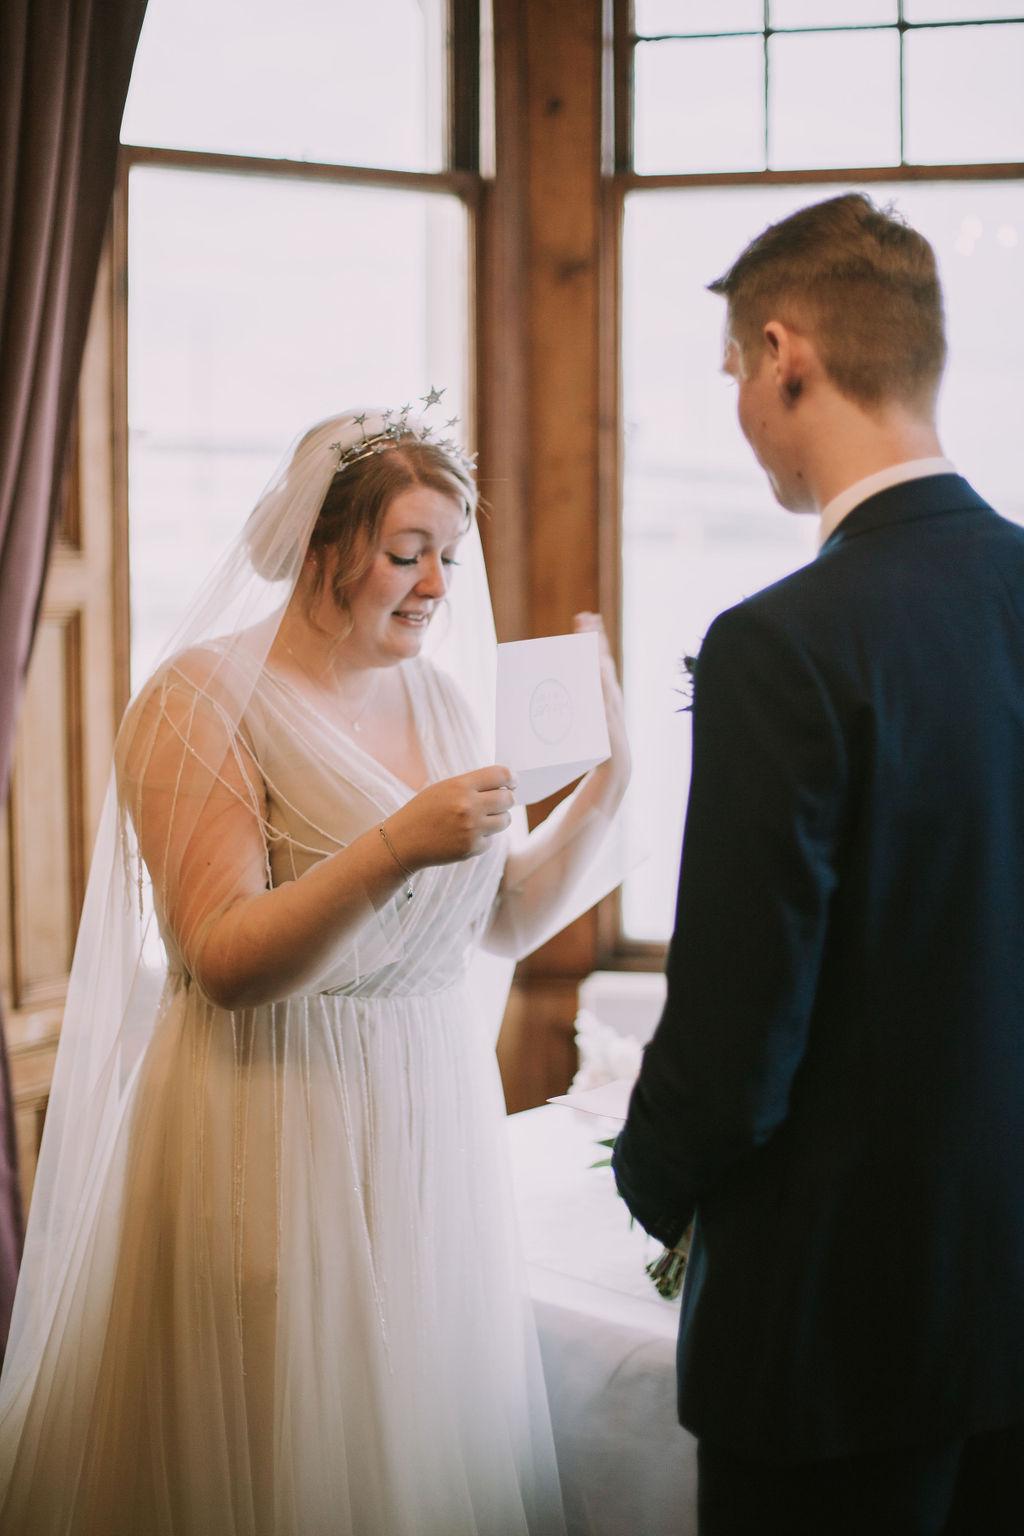 South Queensferry Registrars Wedding Ceremony